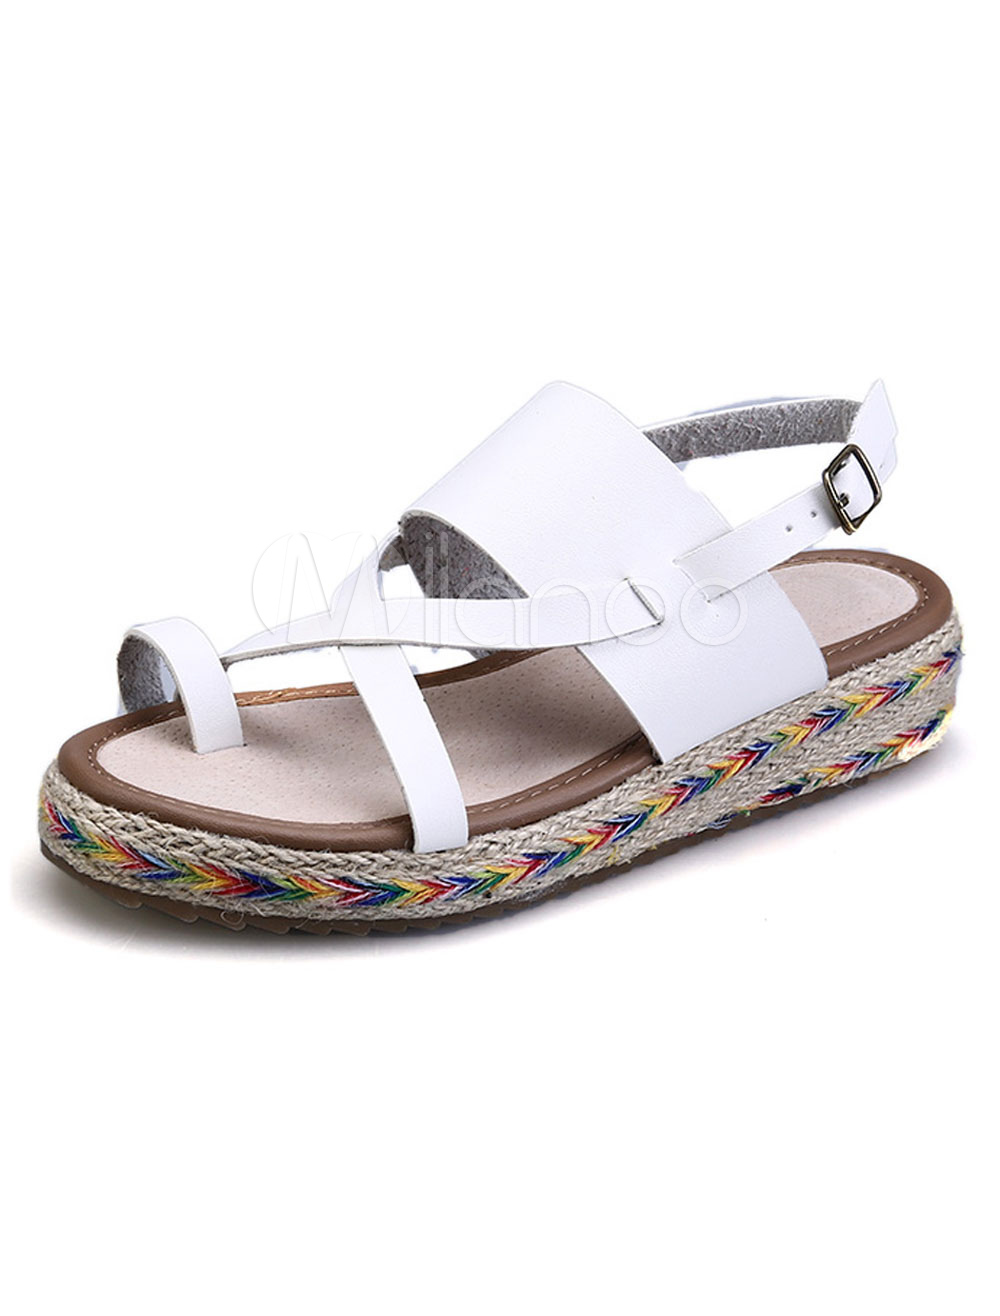 Women Casual Sandal Toe Ring Open Toe Strappy Buckled Flat White Women Summer Sandal